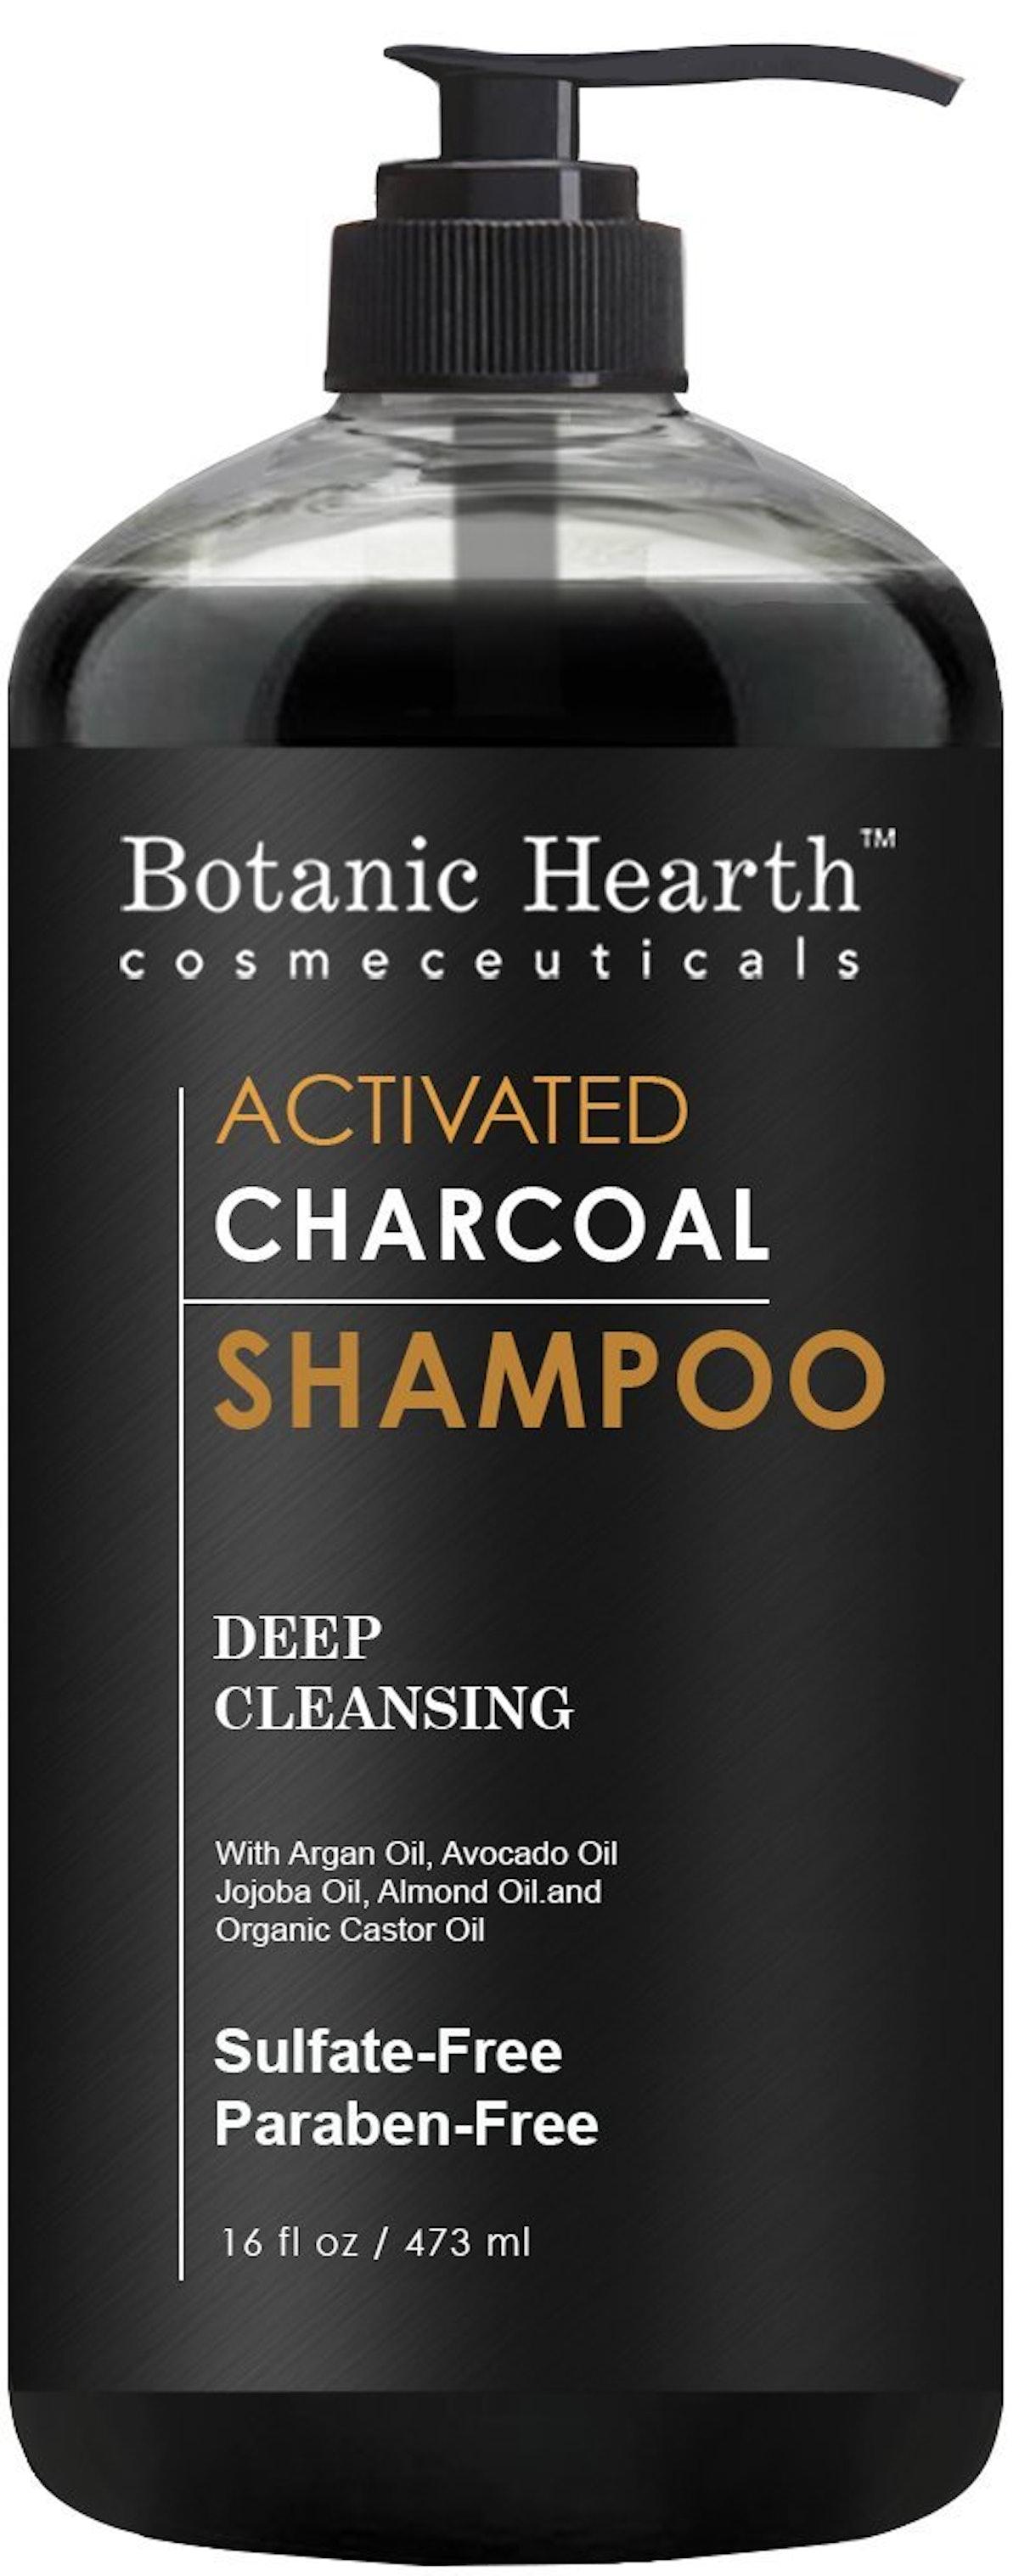 Botanic Hearth Activated Charcoal Shampoo